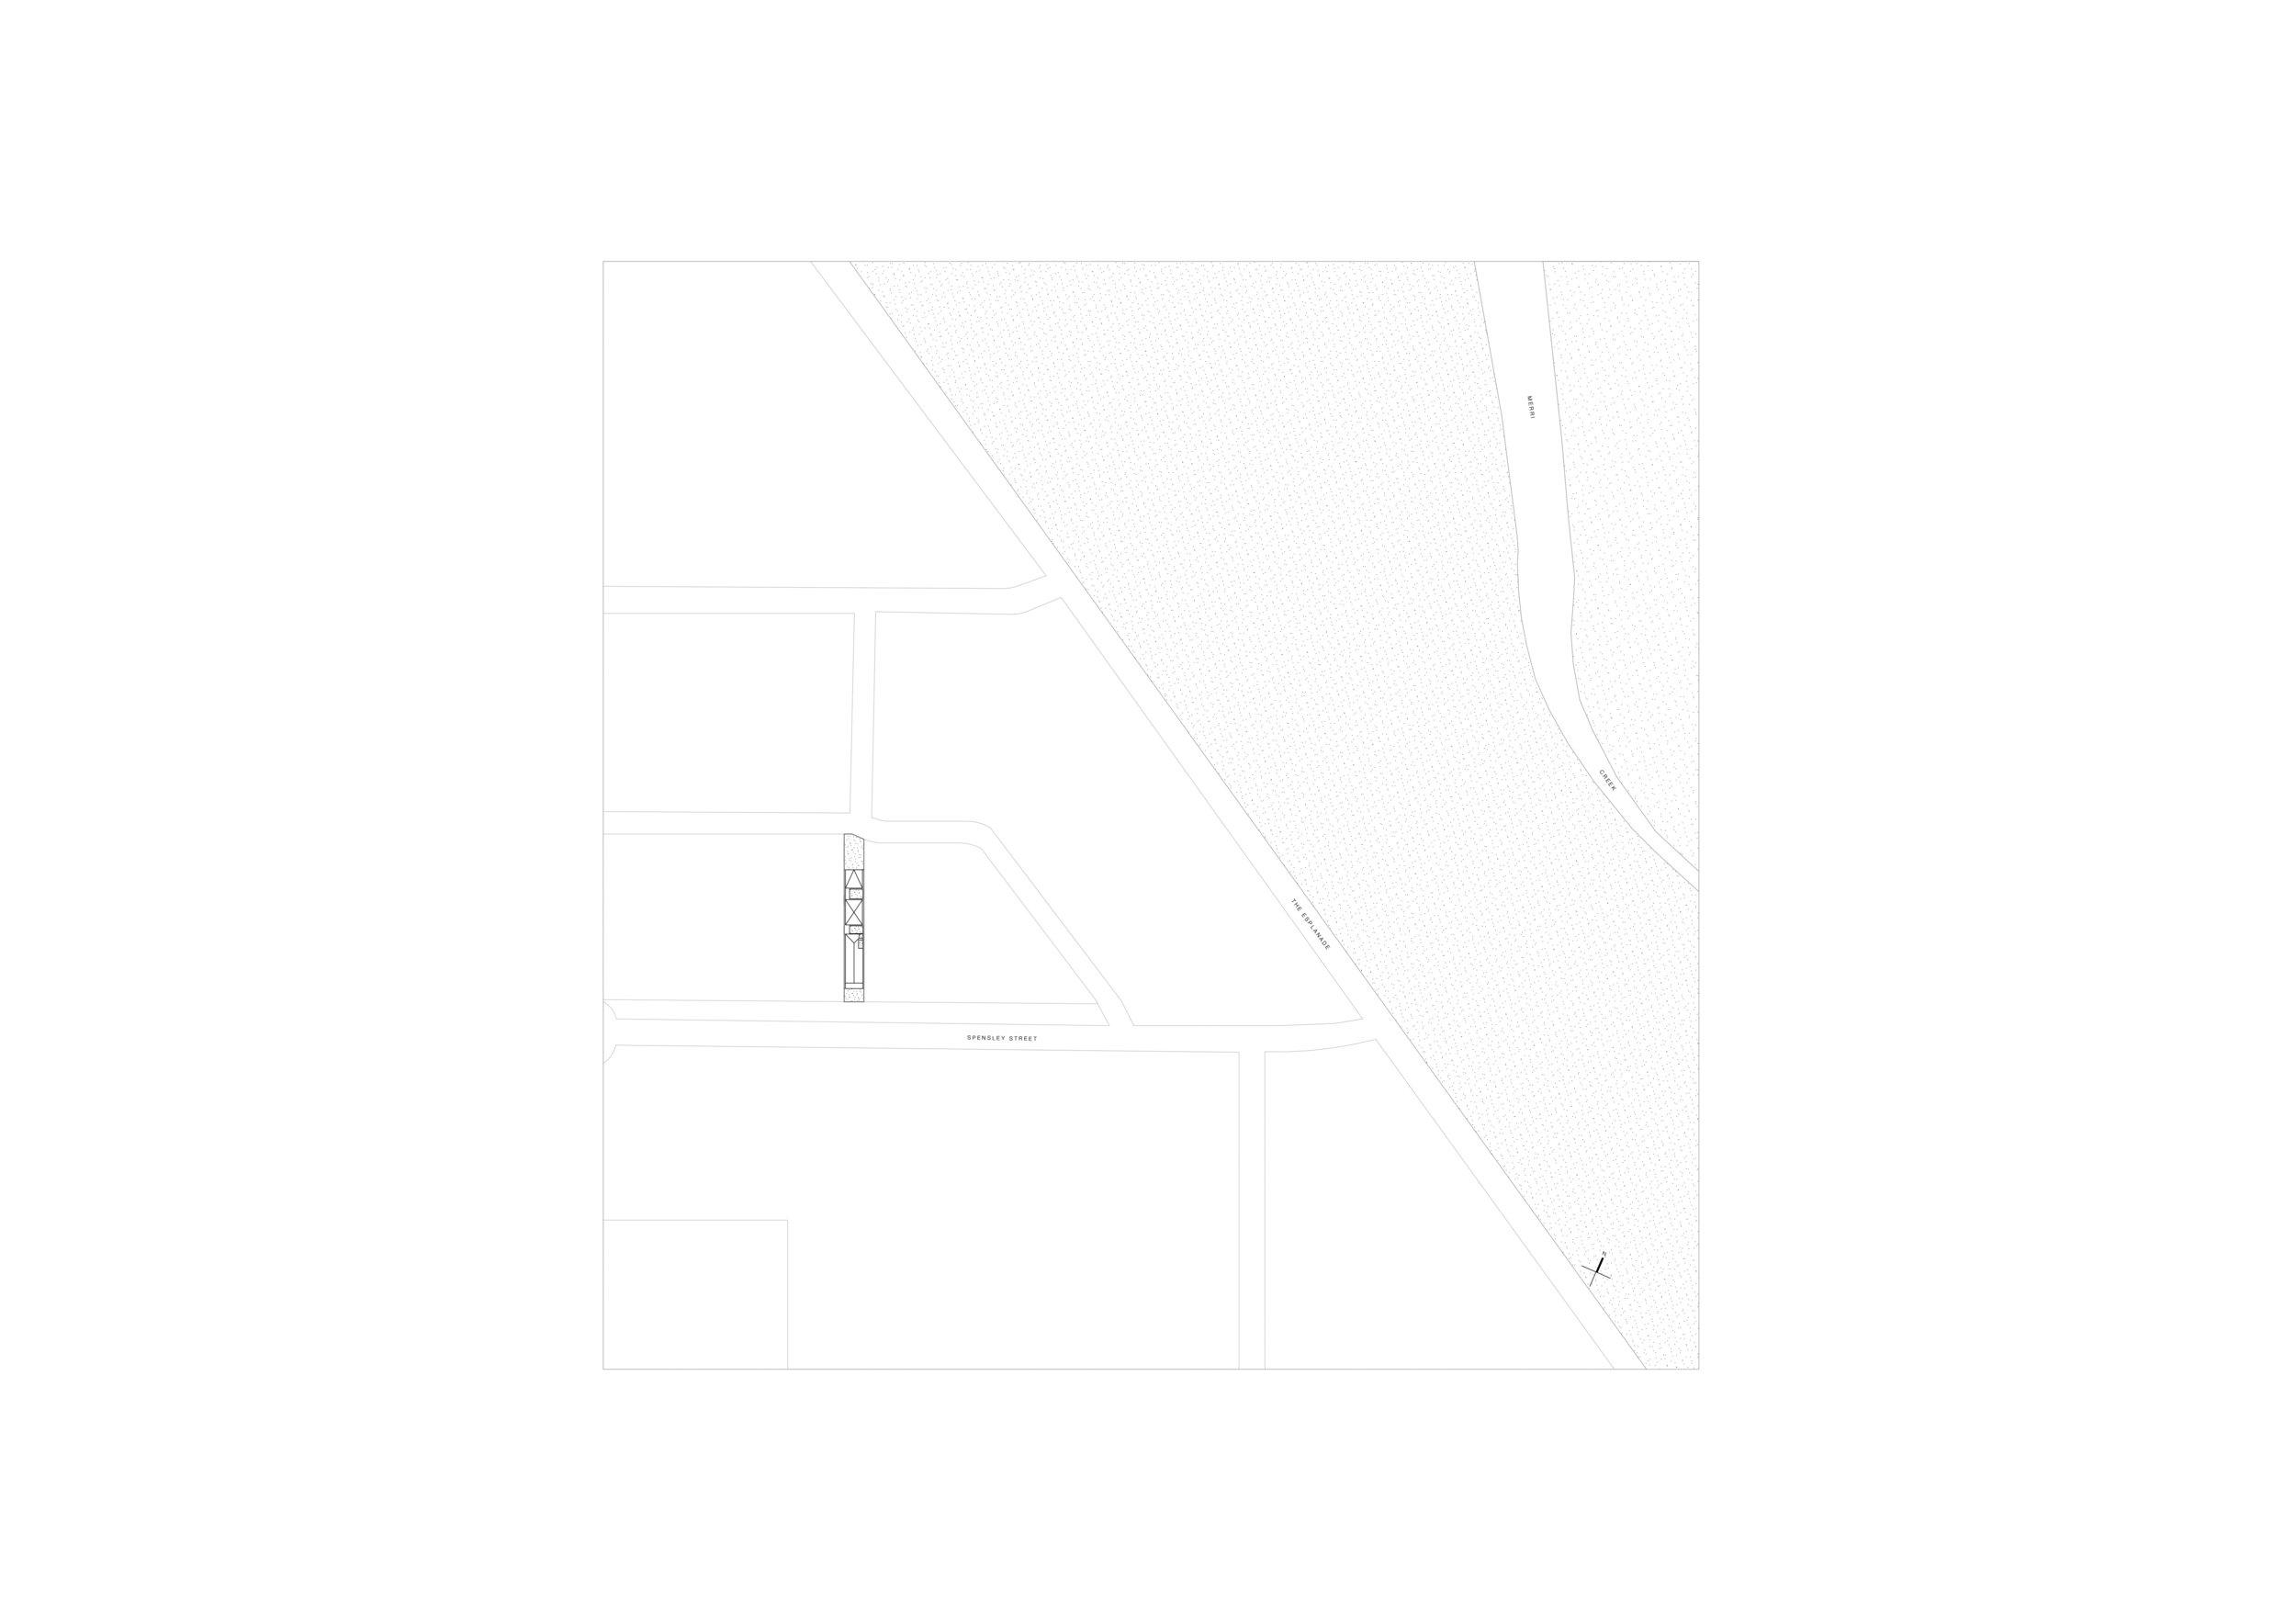 1_Spensley Street_Location Plan_1to1000.jpg